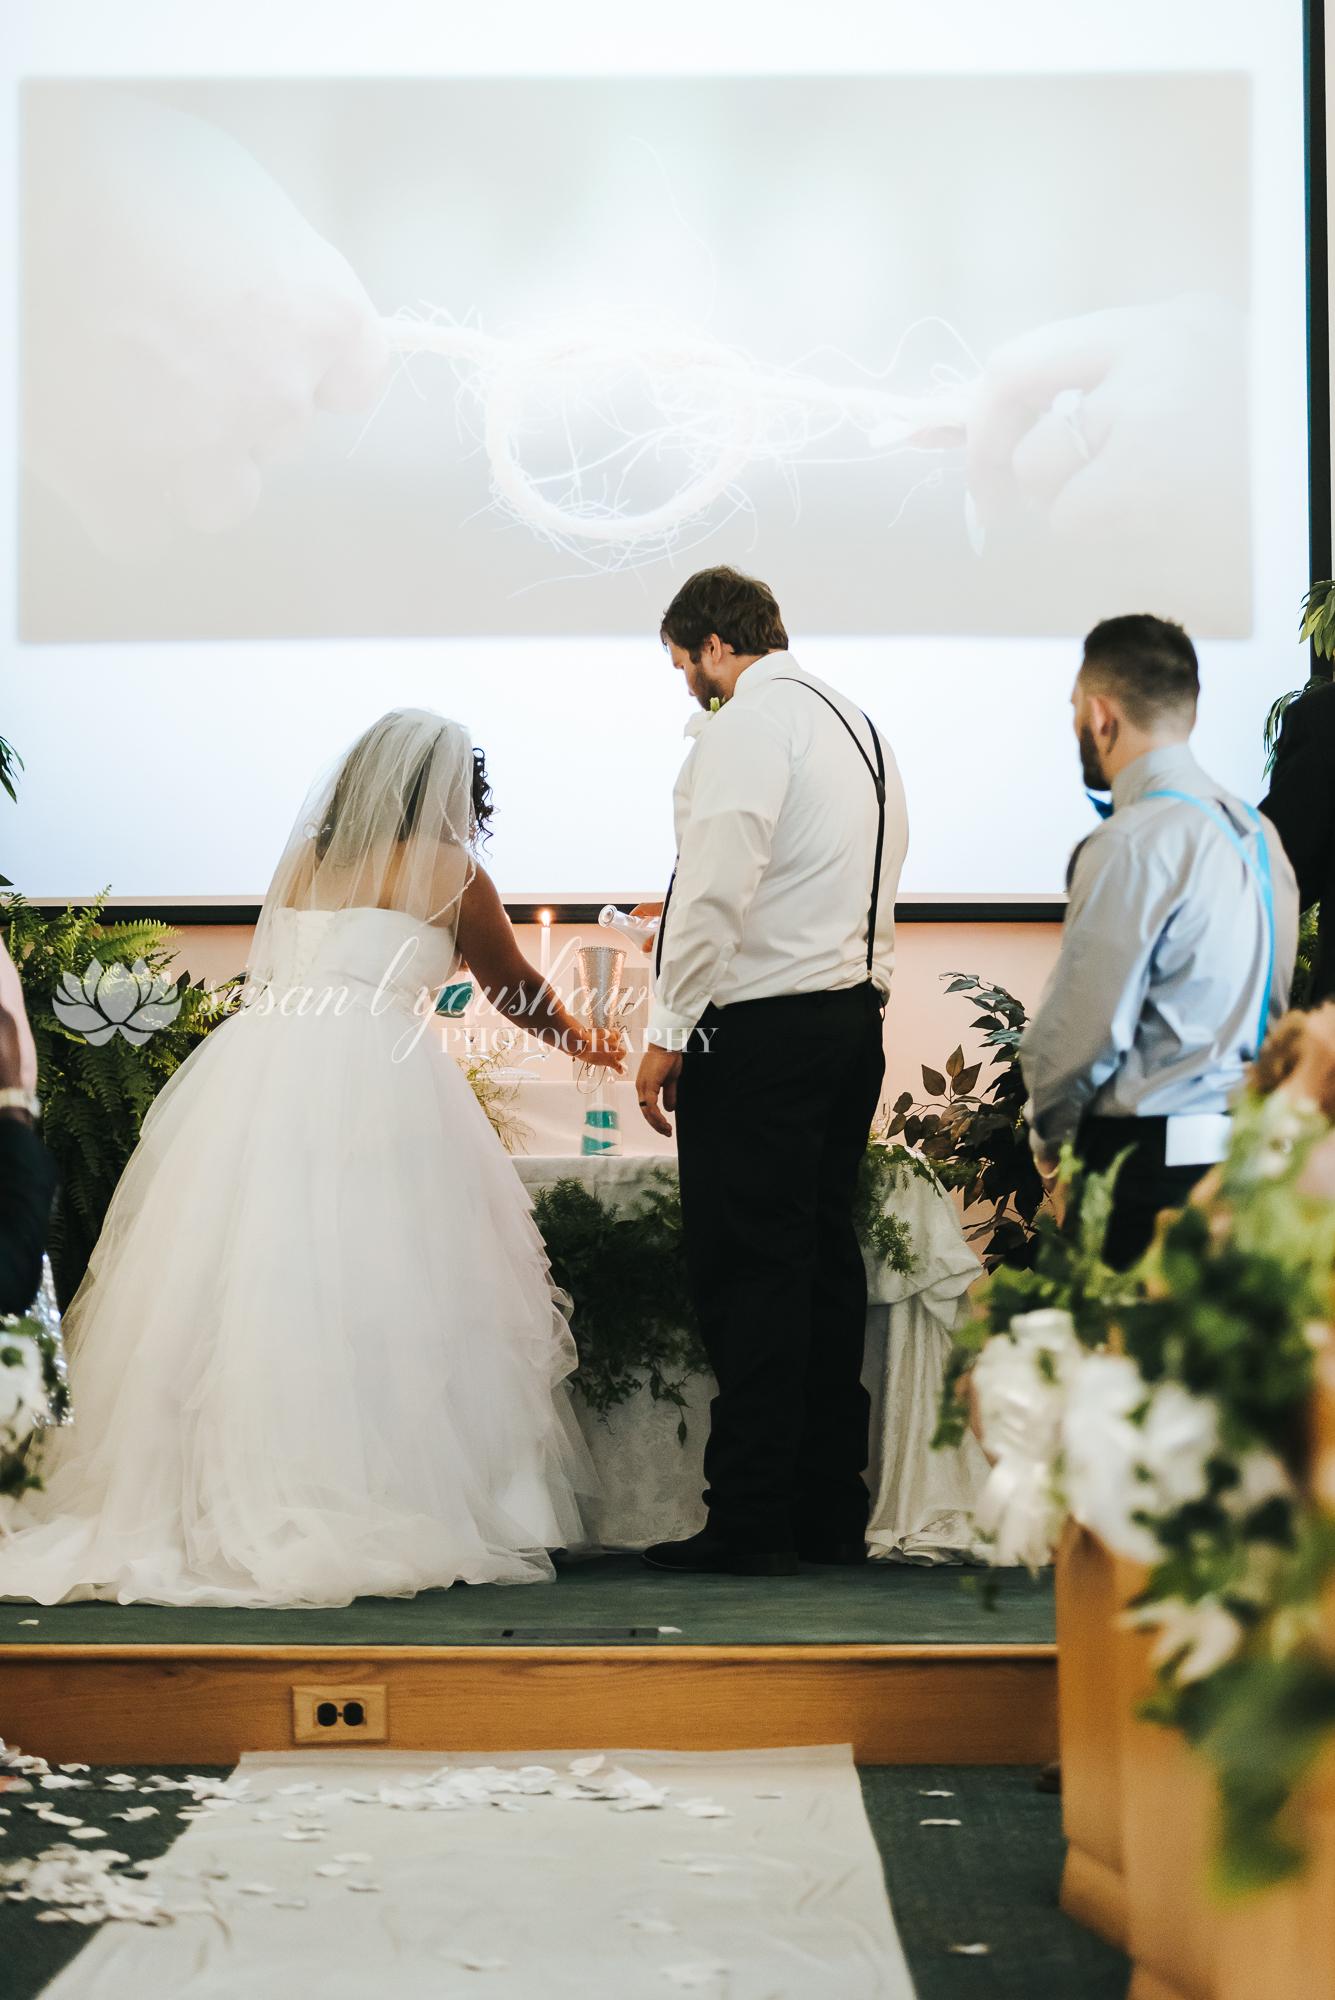 Katelyn and Wes Wedding Photos 07-13-2019 SLY Photography-76.jpg